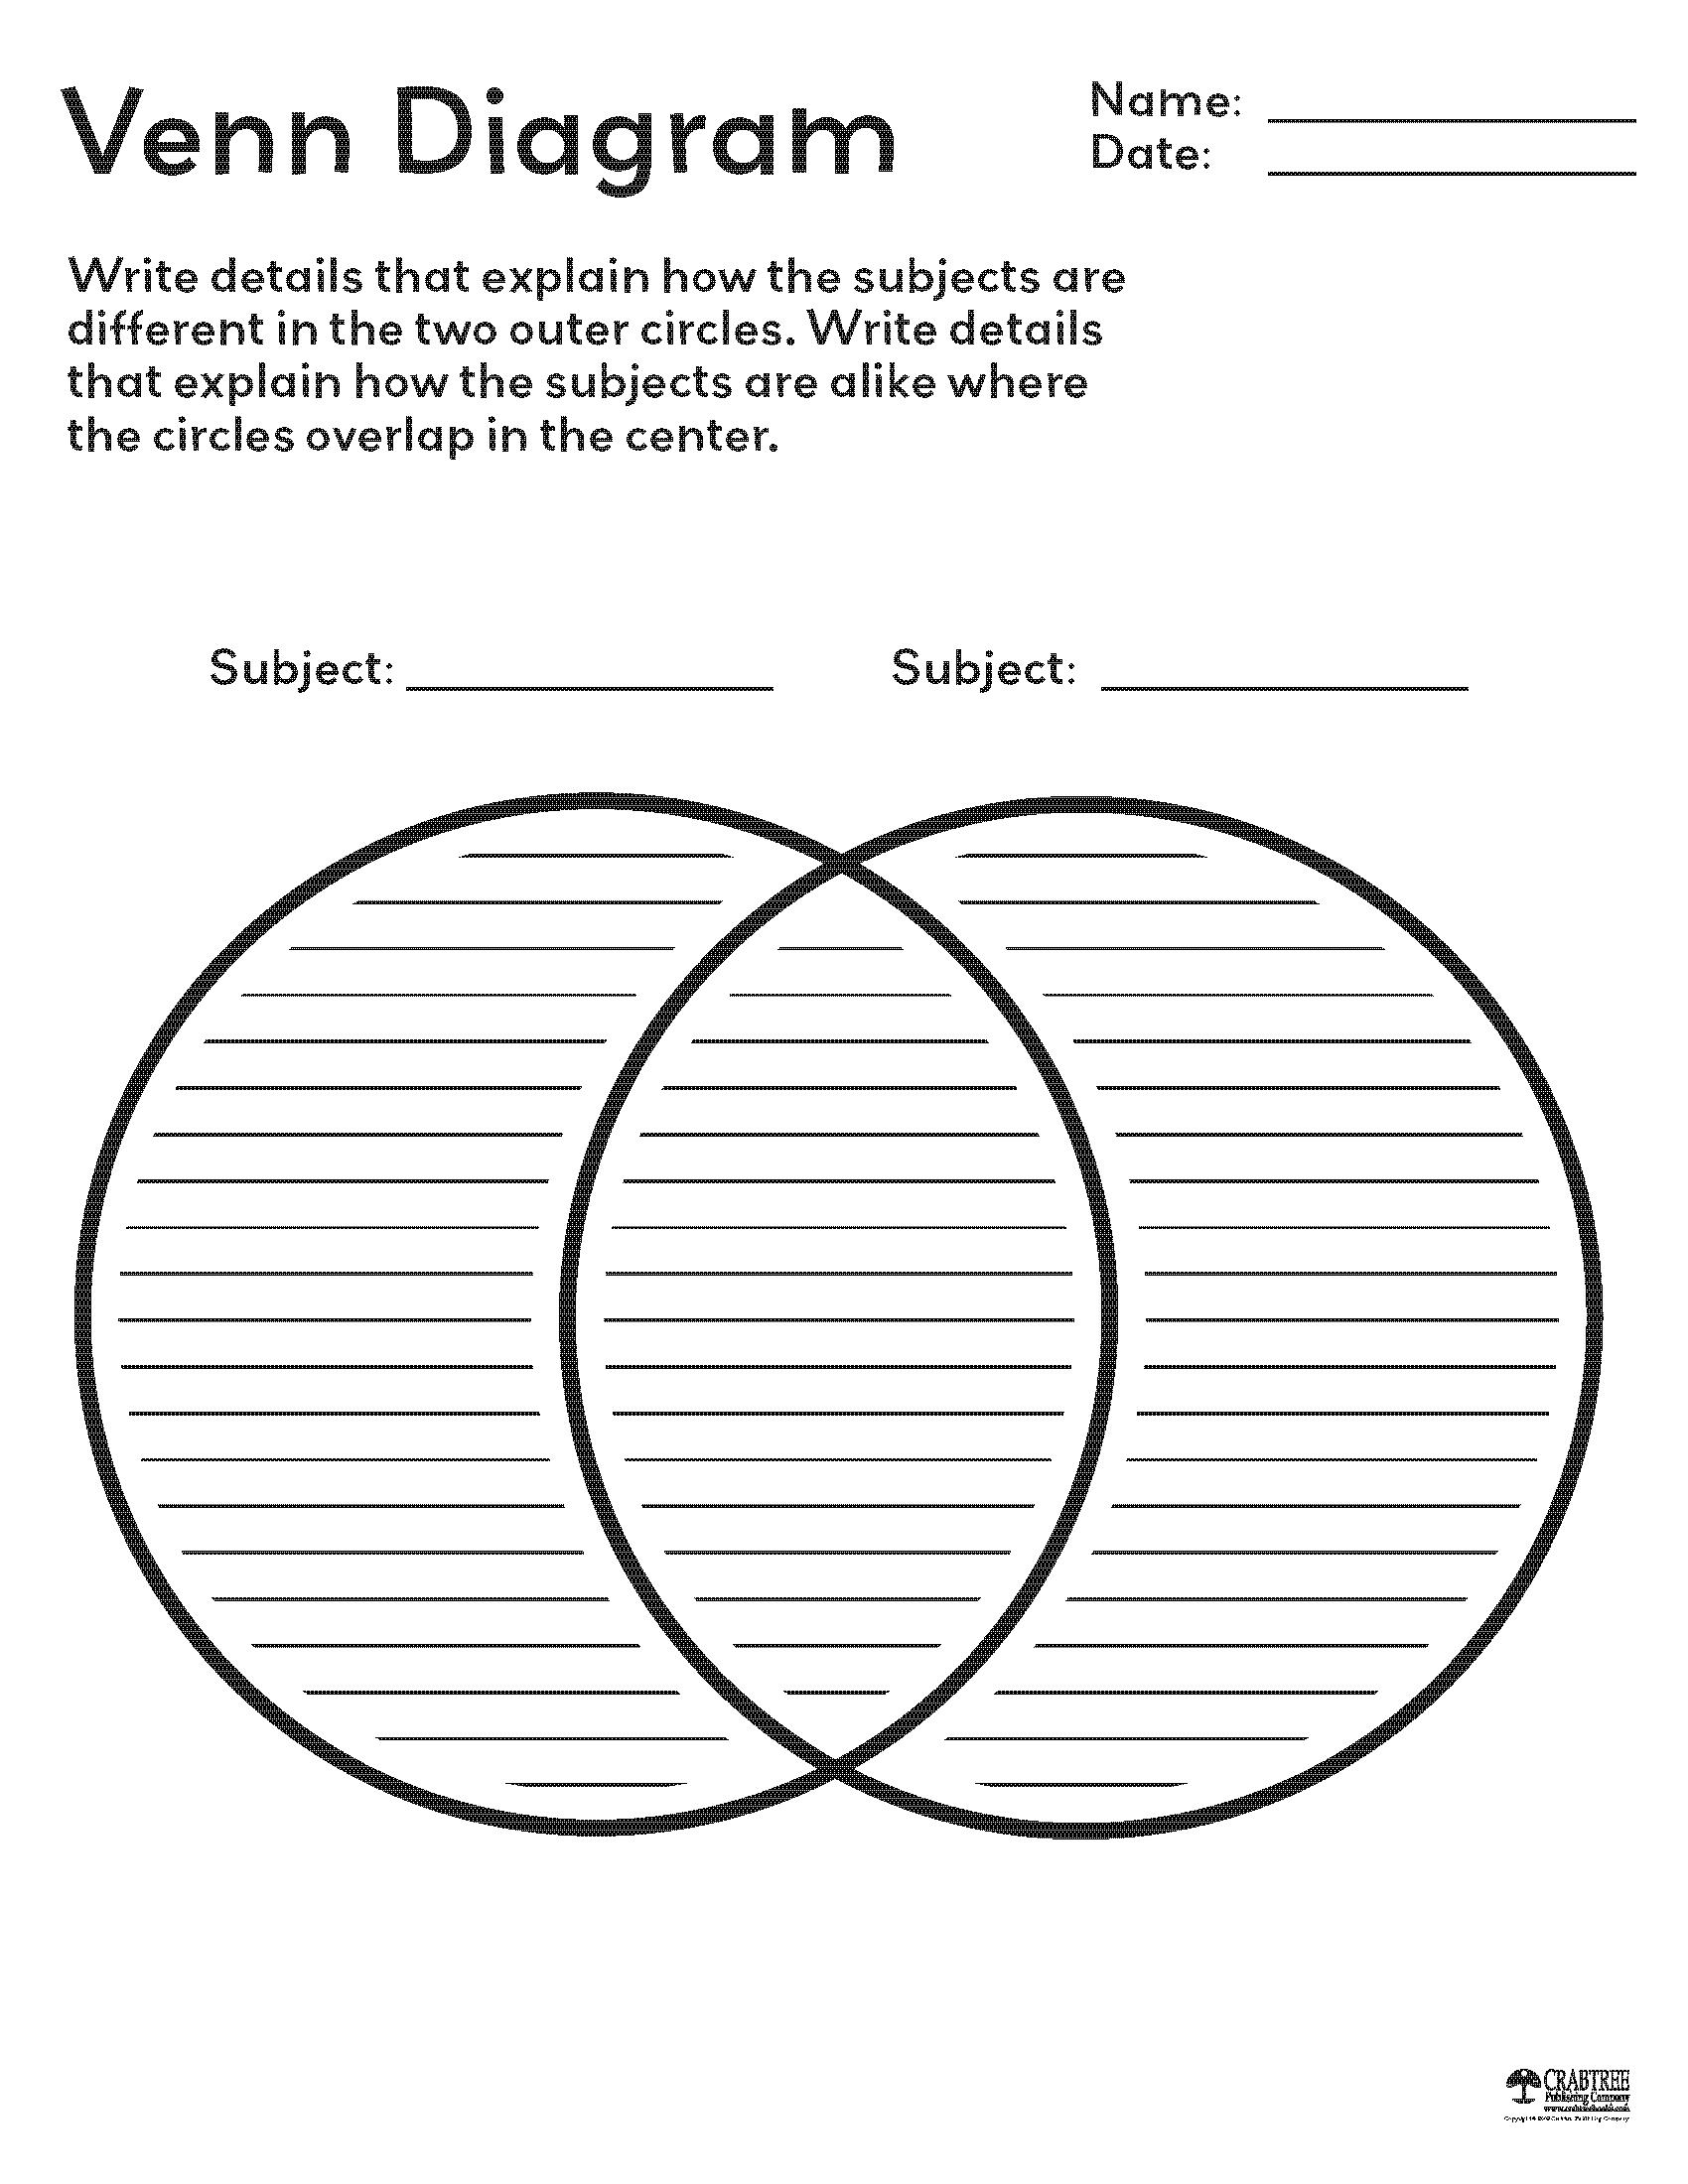 image about Printable Venn Diagram With Lines titled totally free printable venn diagram with traces - Kadil